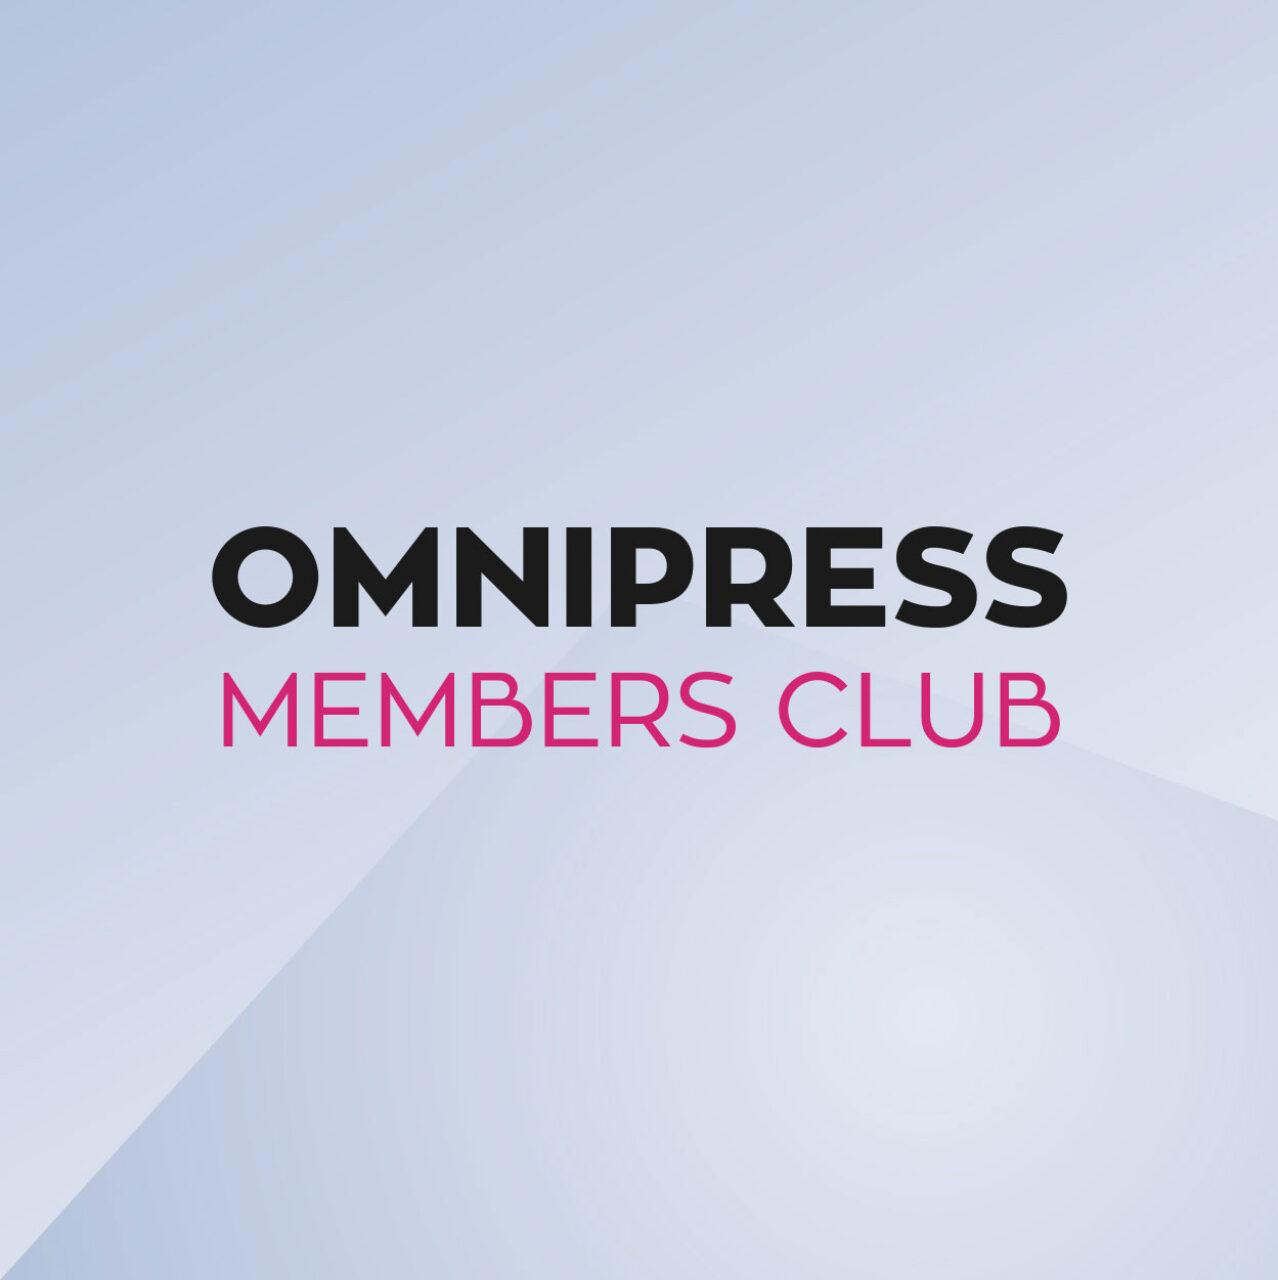 omnipress-members-club-banner